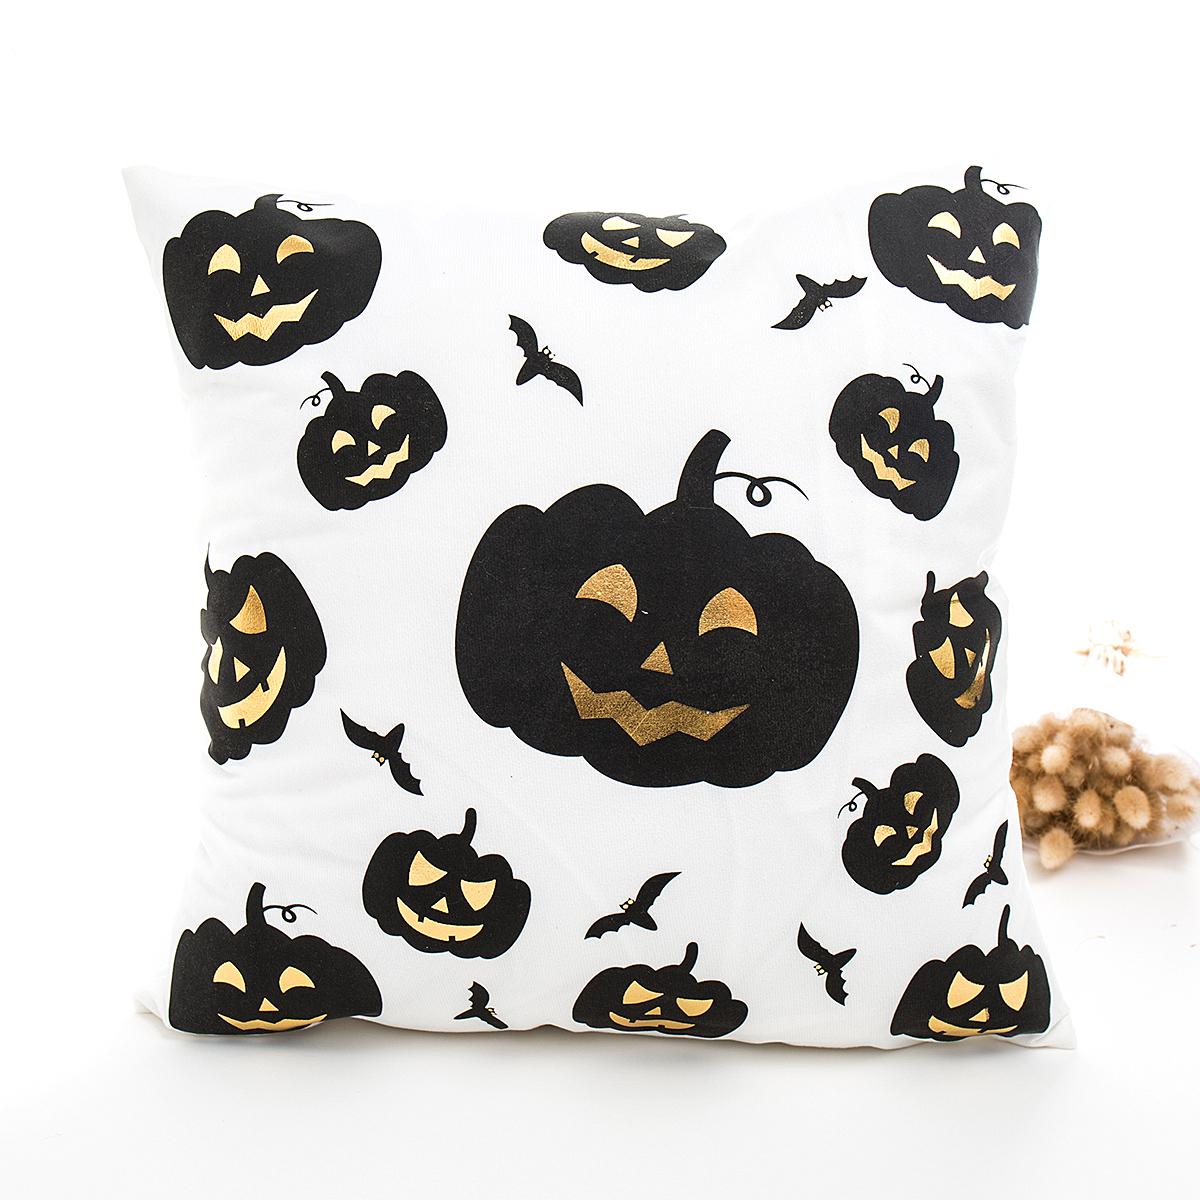 Halloween Series Hot Stamping Pattern Throw Pillow Cover Pumpkin white bottom_45*45cm